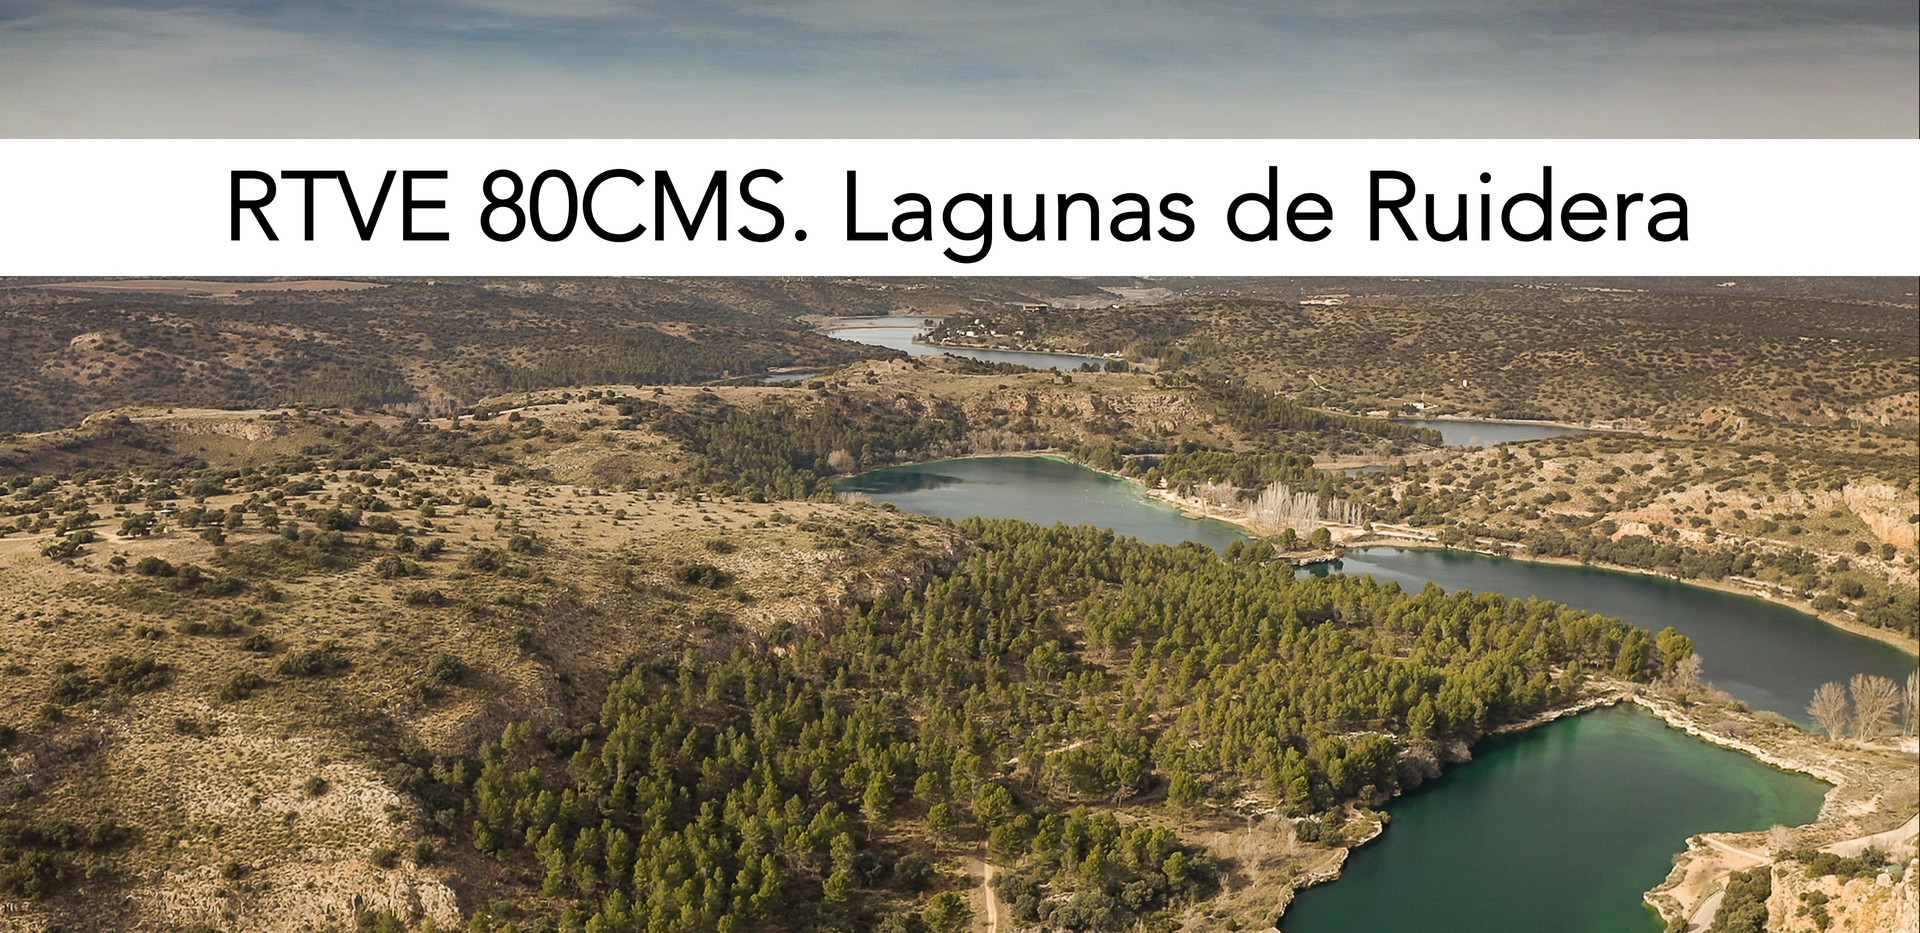 RTVE Lagunas de Ruidera